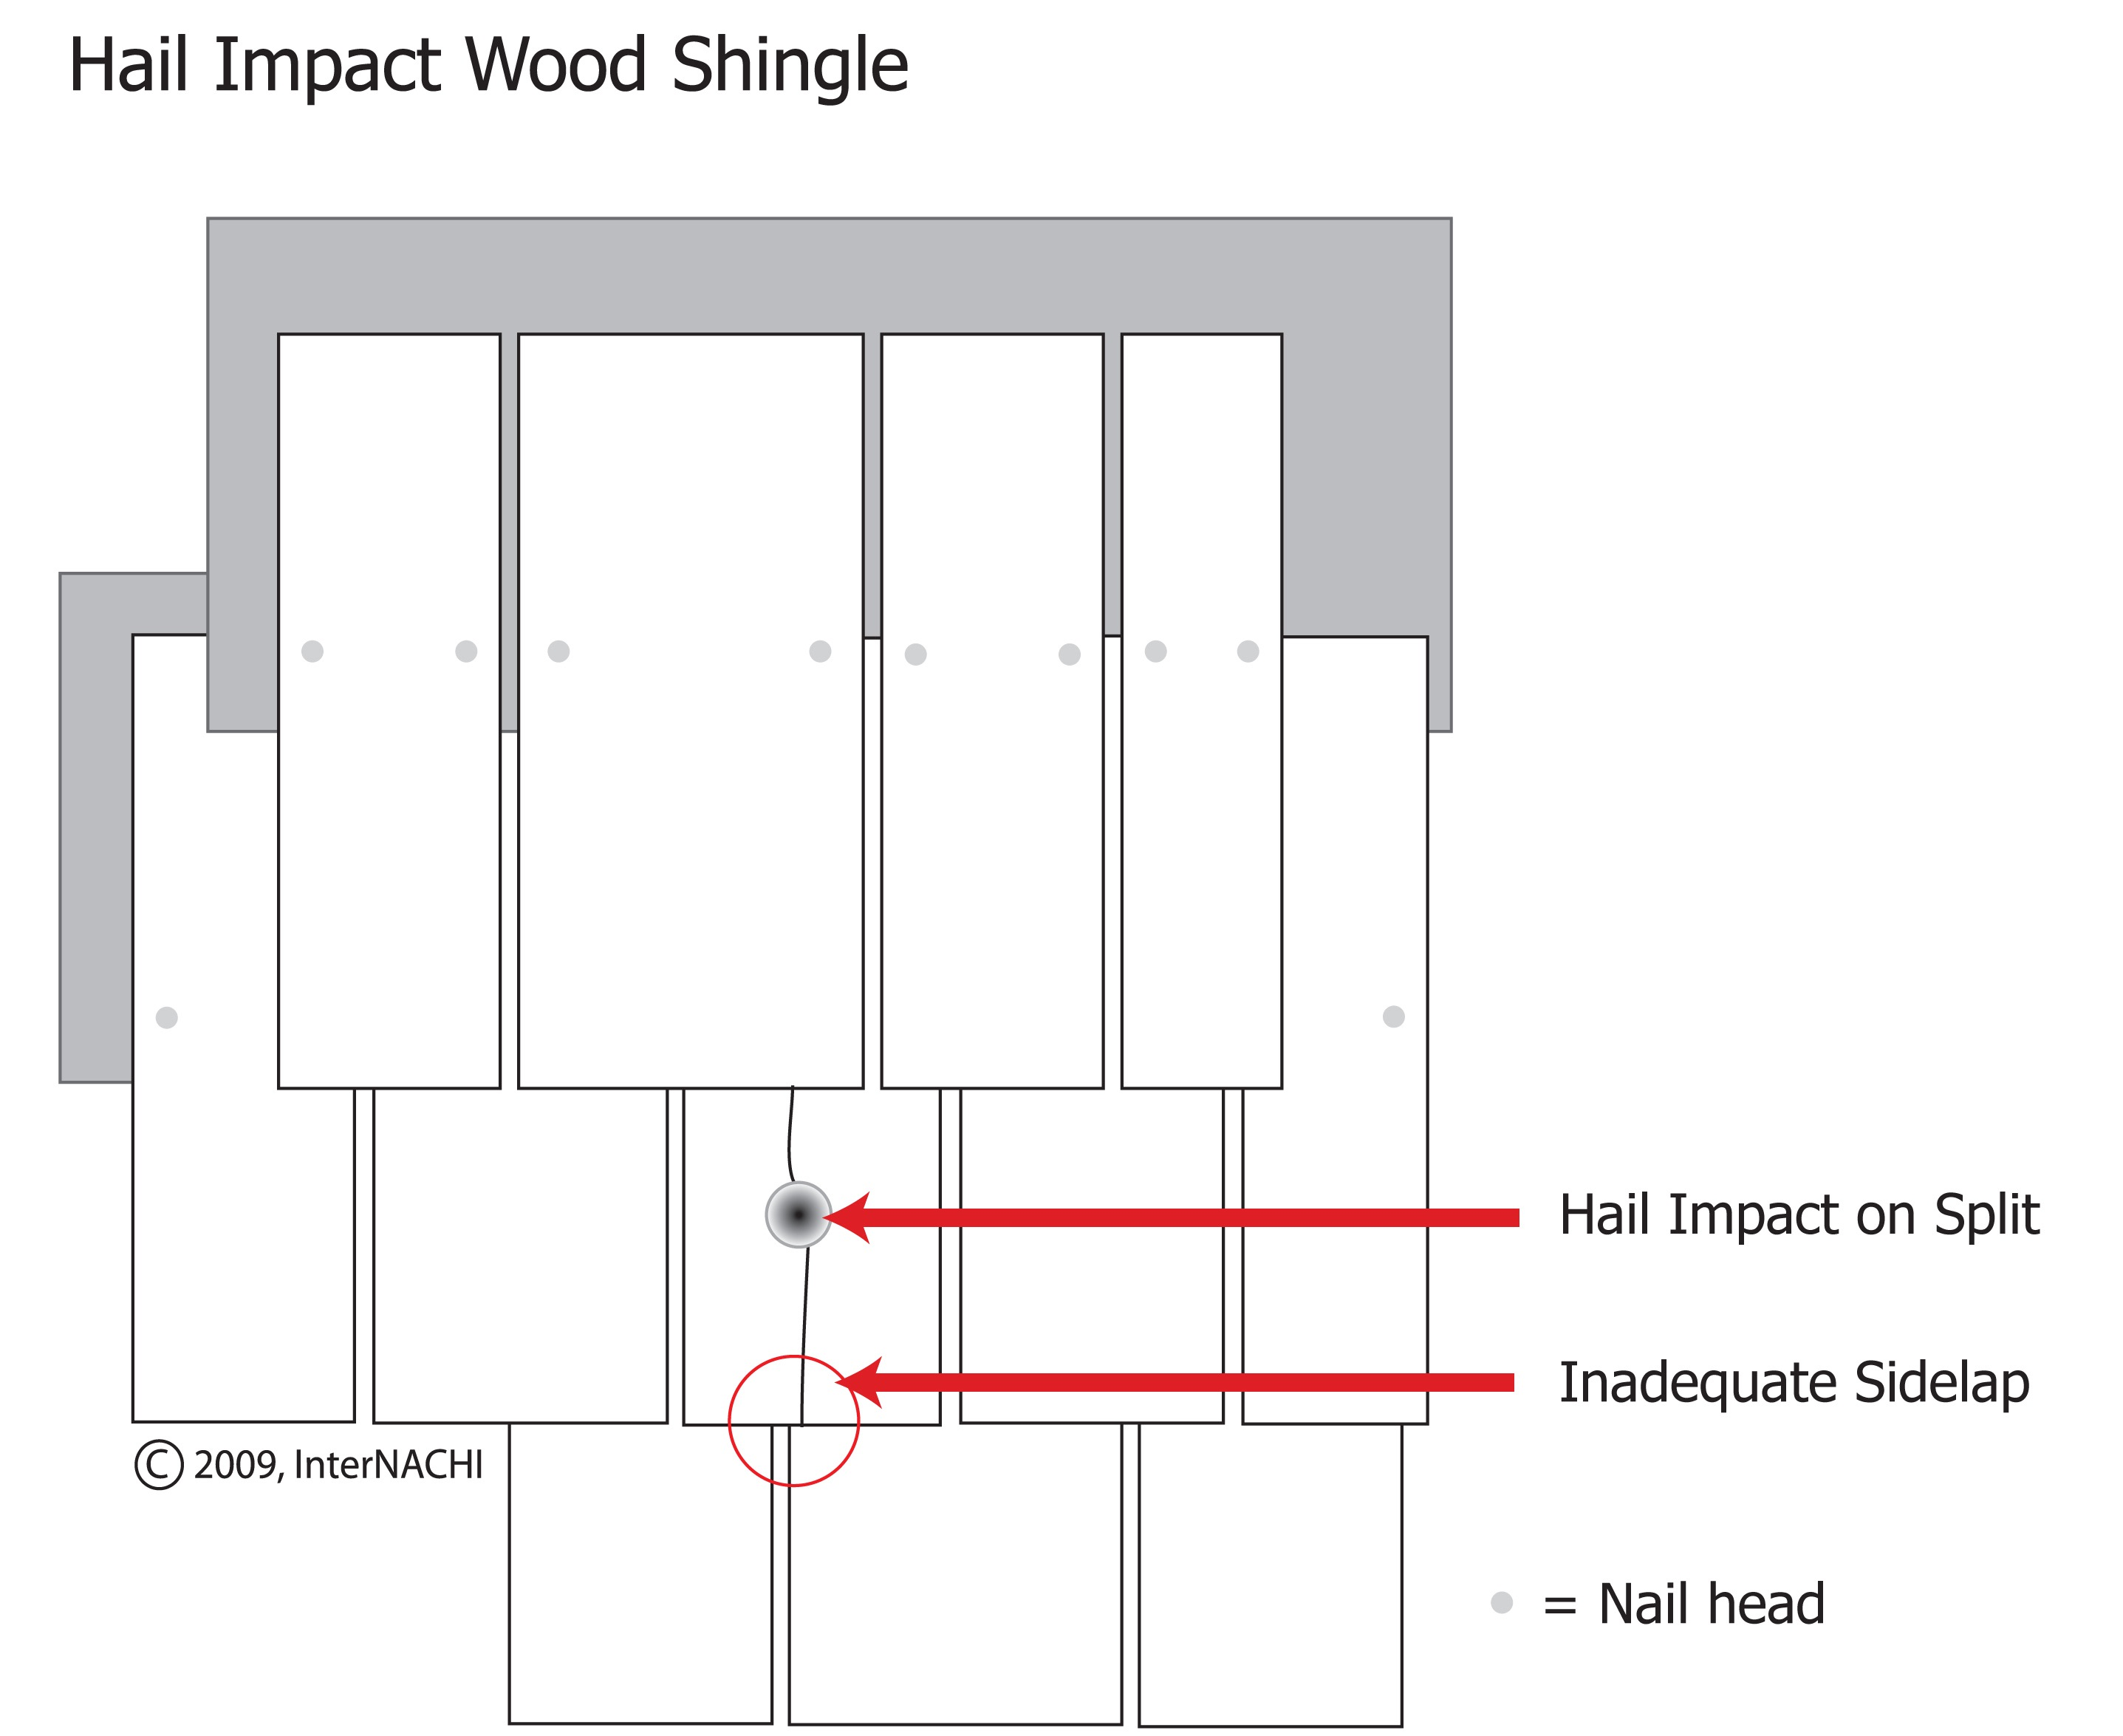 Hail impact on wood shingles.